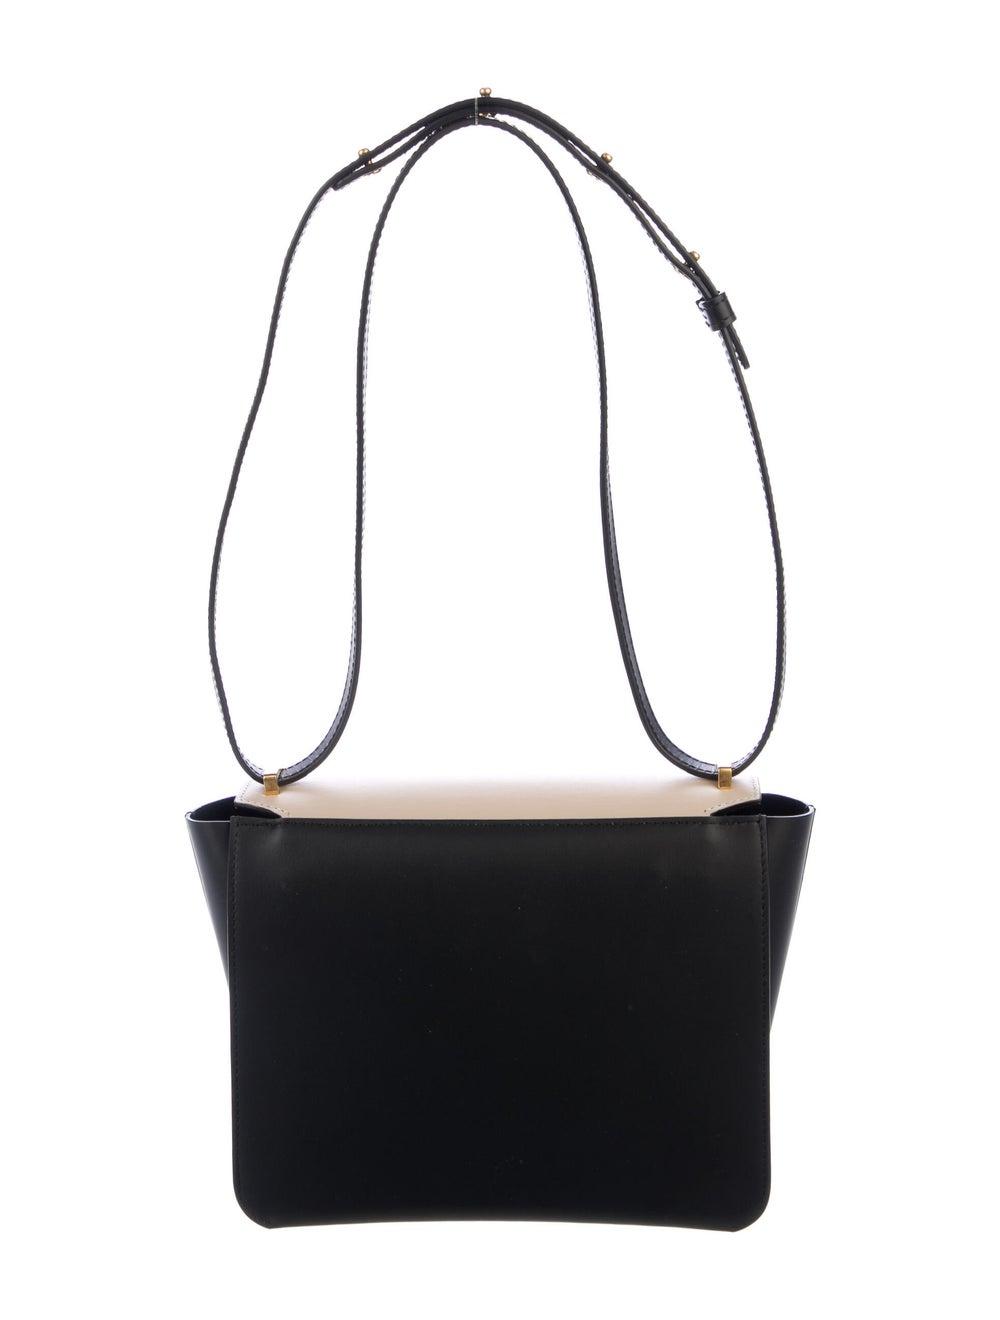 Wandler Leather Colorblock Crossbody Bag Black - image 4